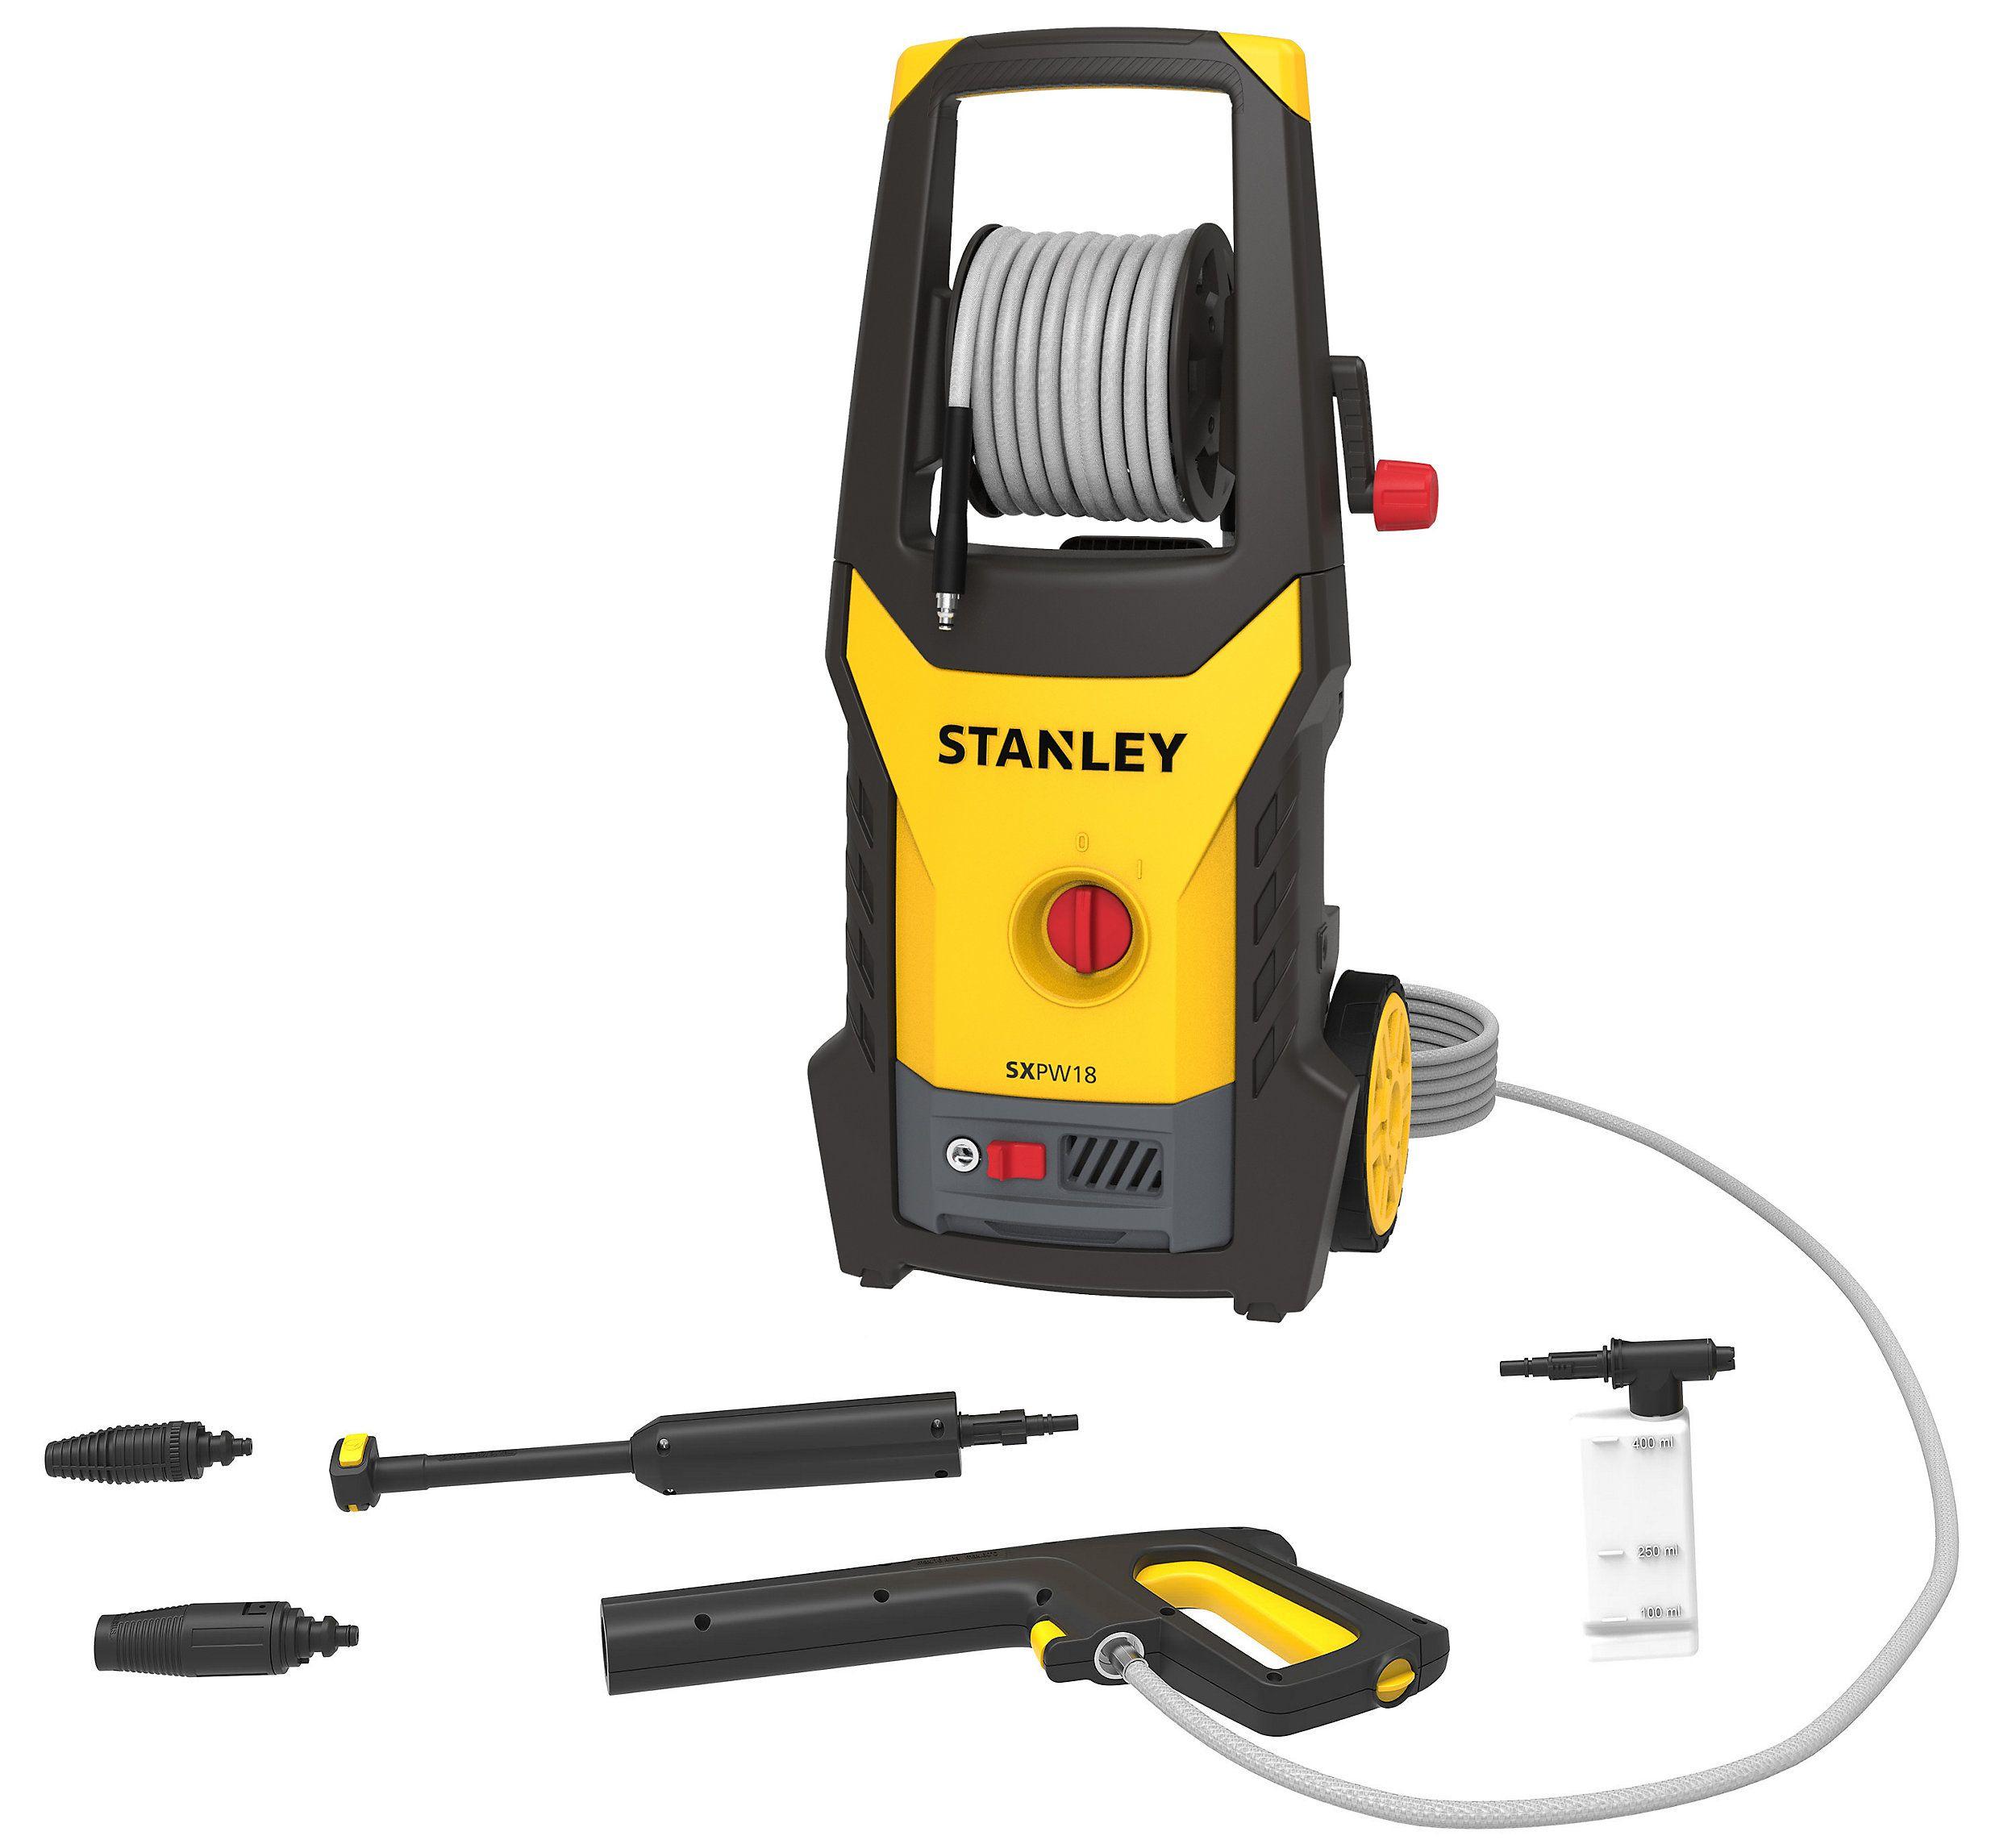 Nettoyeur haute pression Stanley - 1800 W